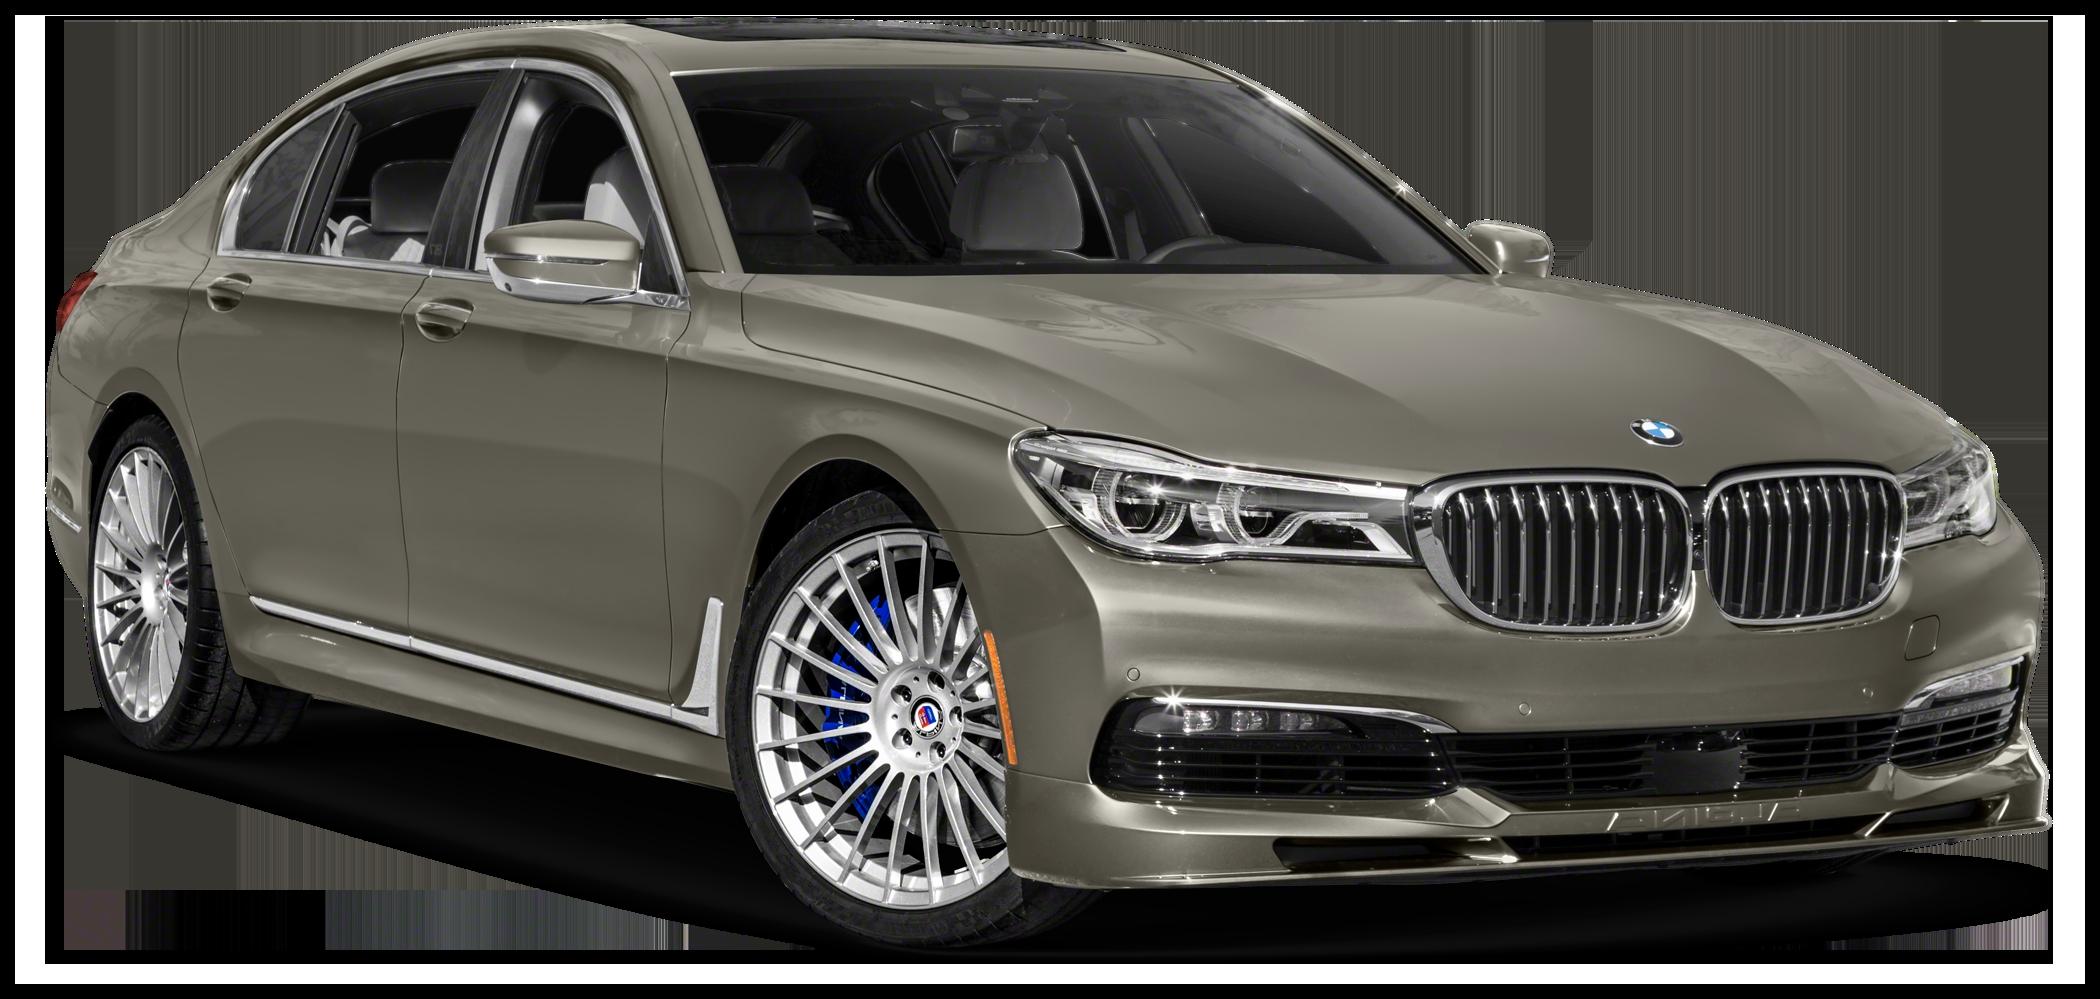 Current 2019 BMW ALPINA B7 Sedan Special offers